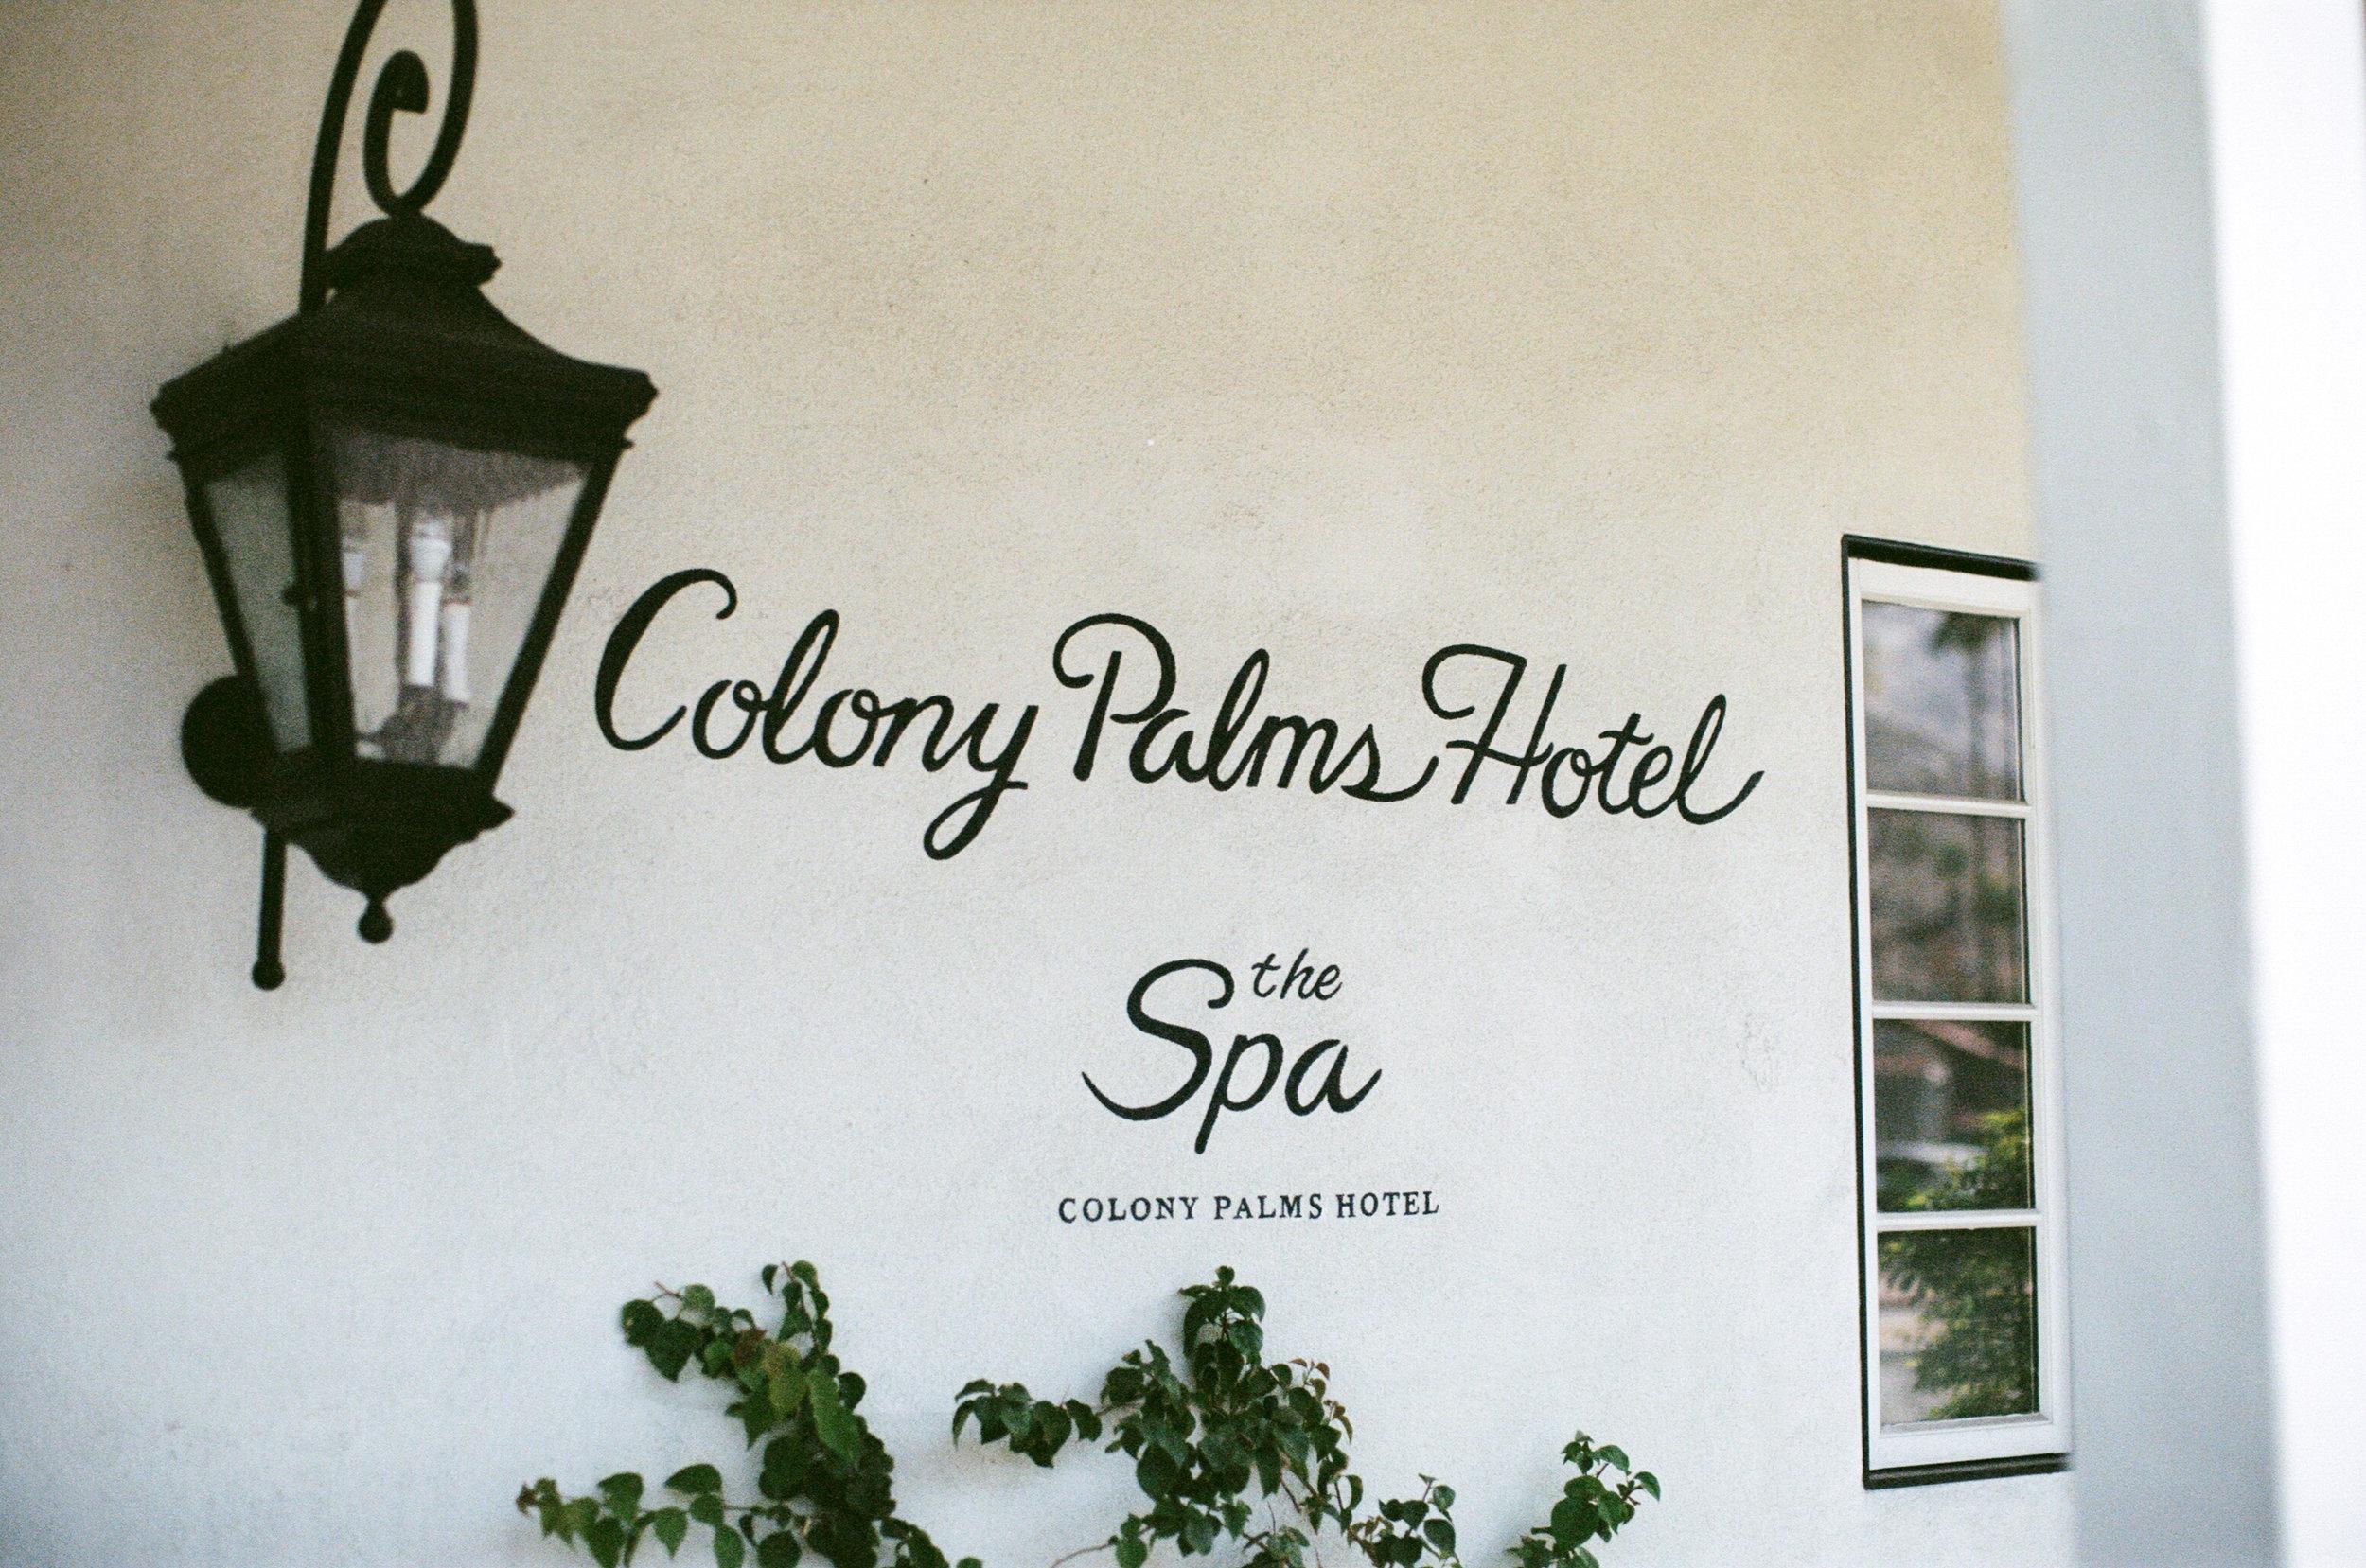 Dara_&_Garrett_Colony_Palms_Hotel_Wedding_Photos-4.jpg